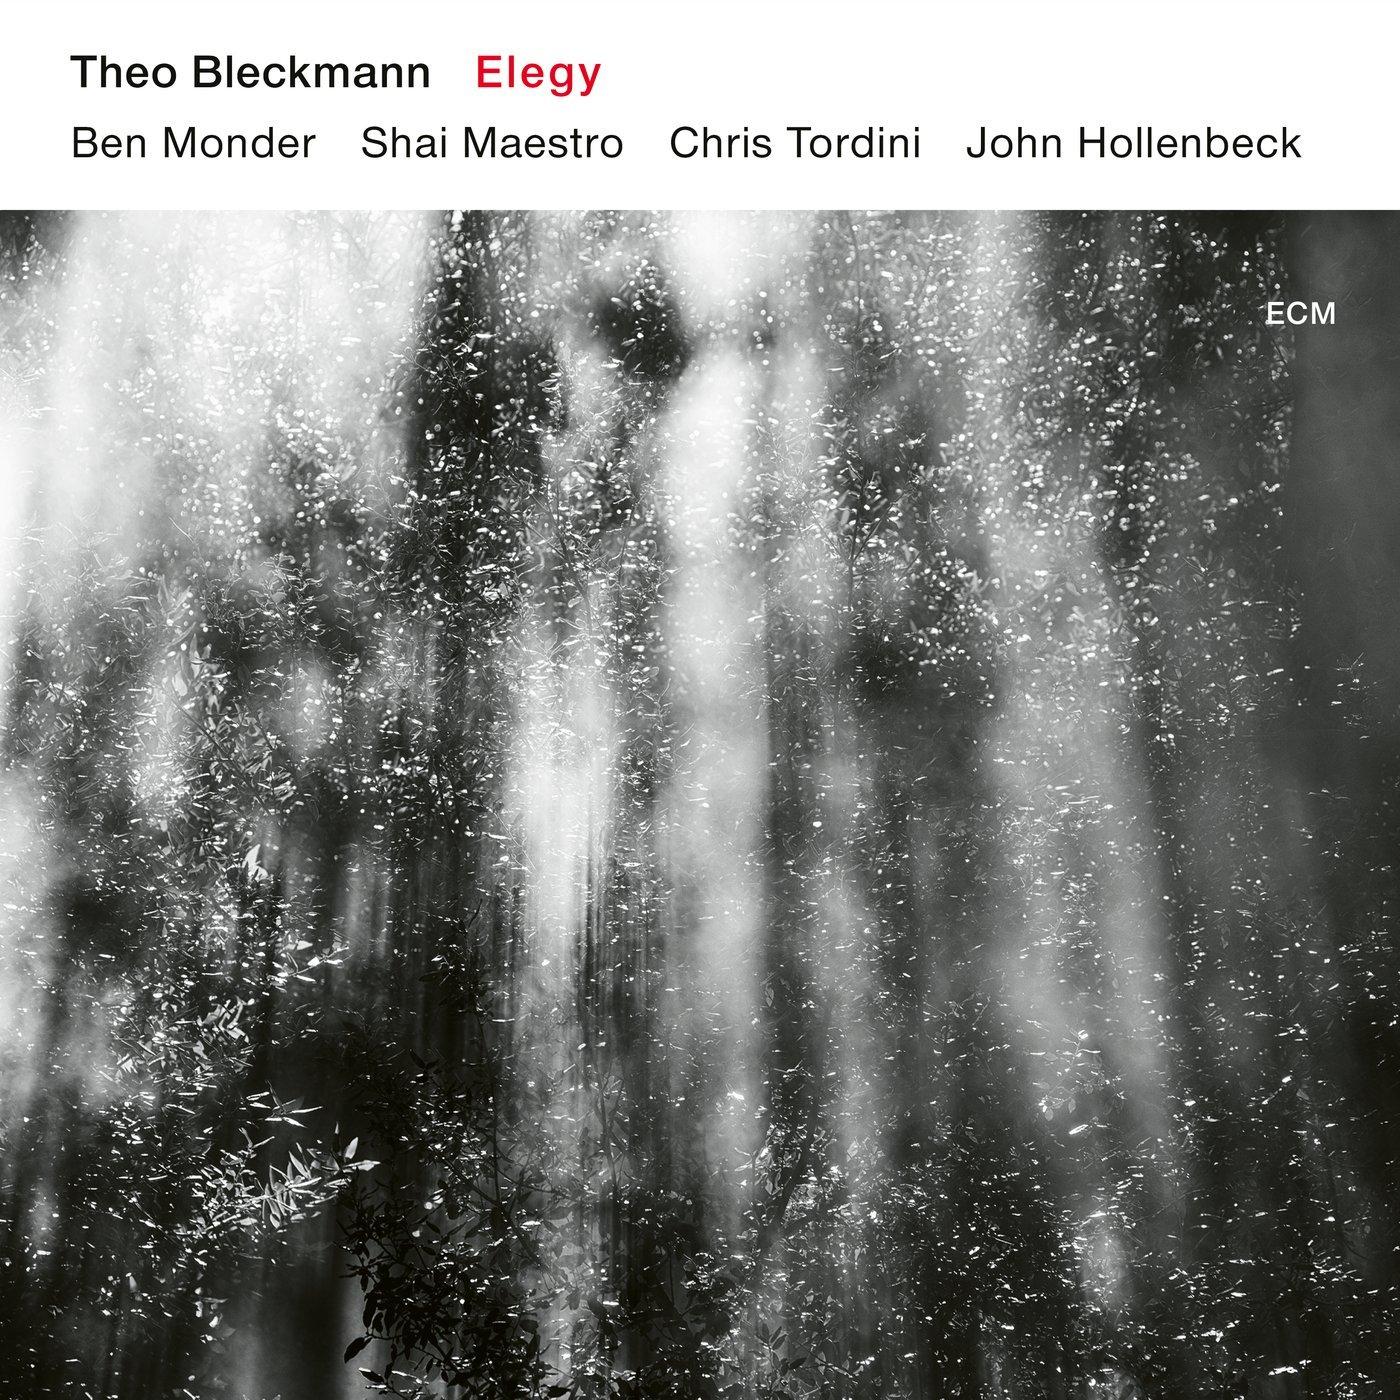 Theo Bleckmann Elegy Cover.jpg